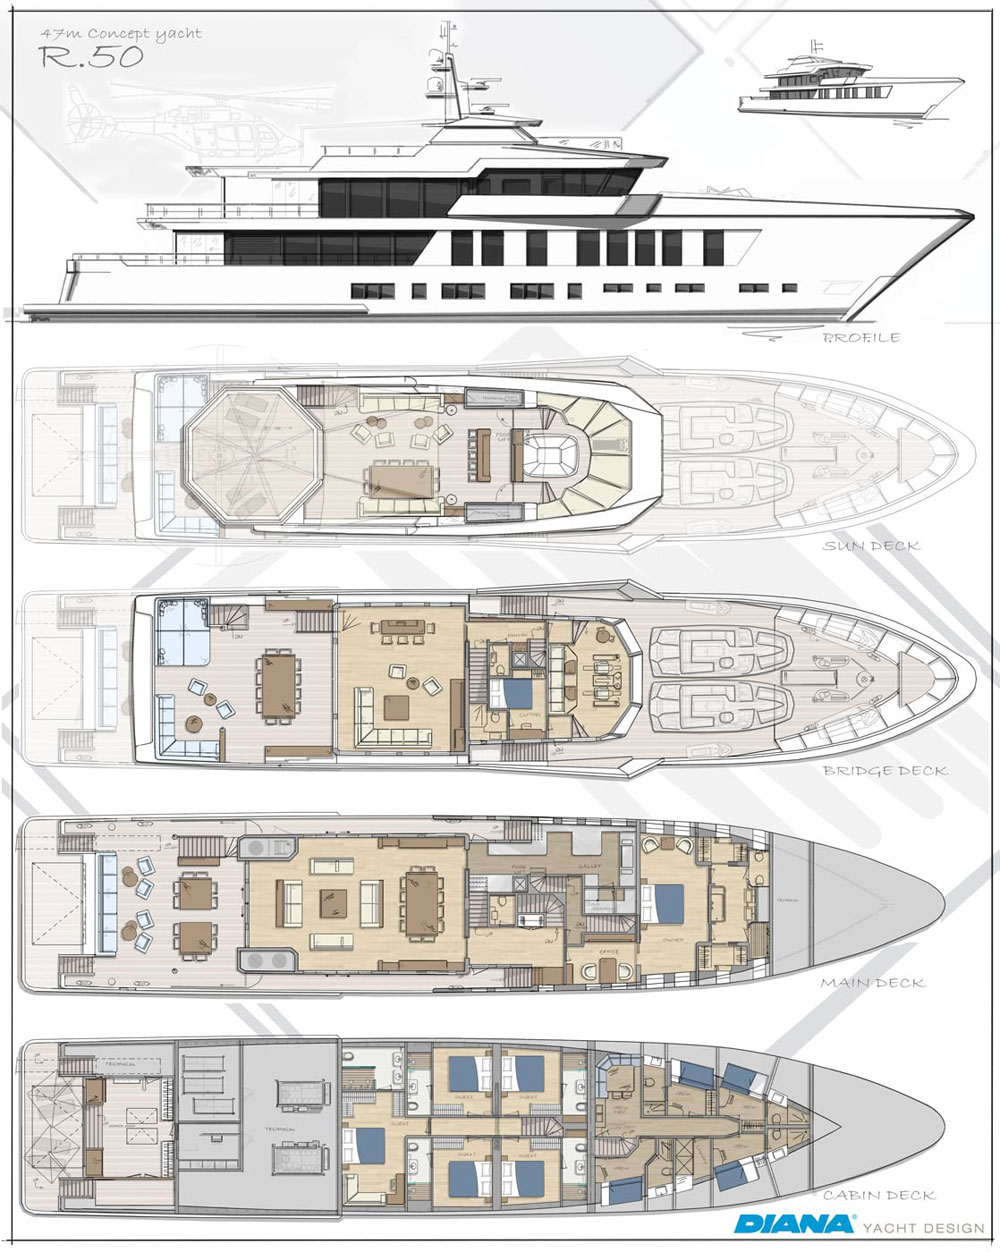 Diana Yacht Design R.50 Layout